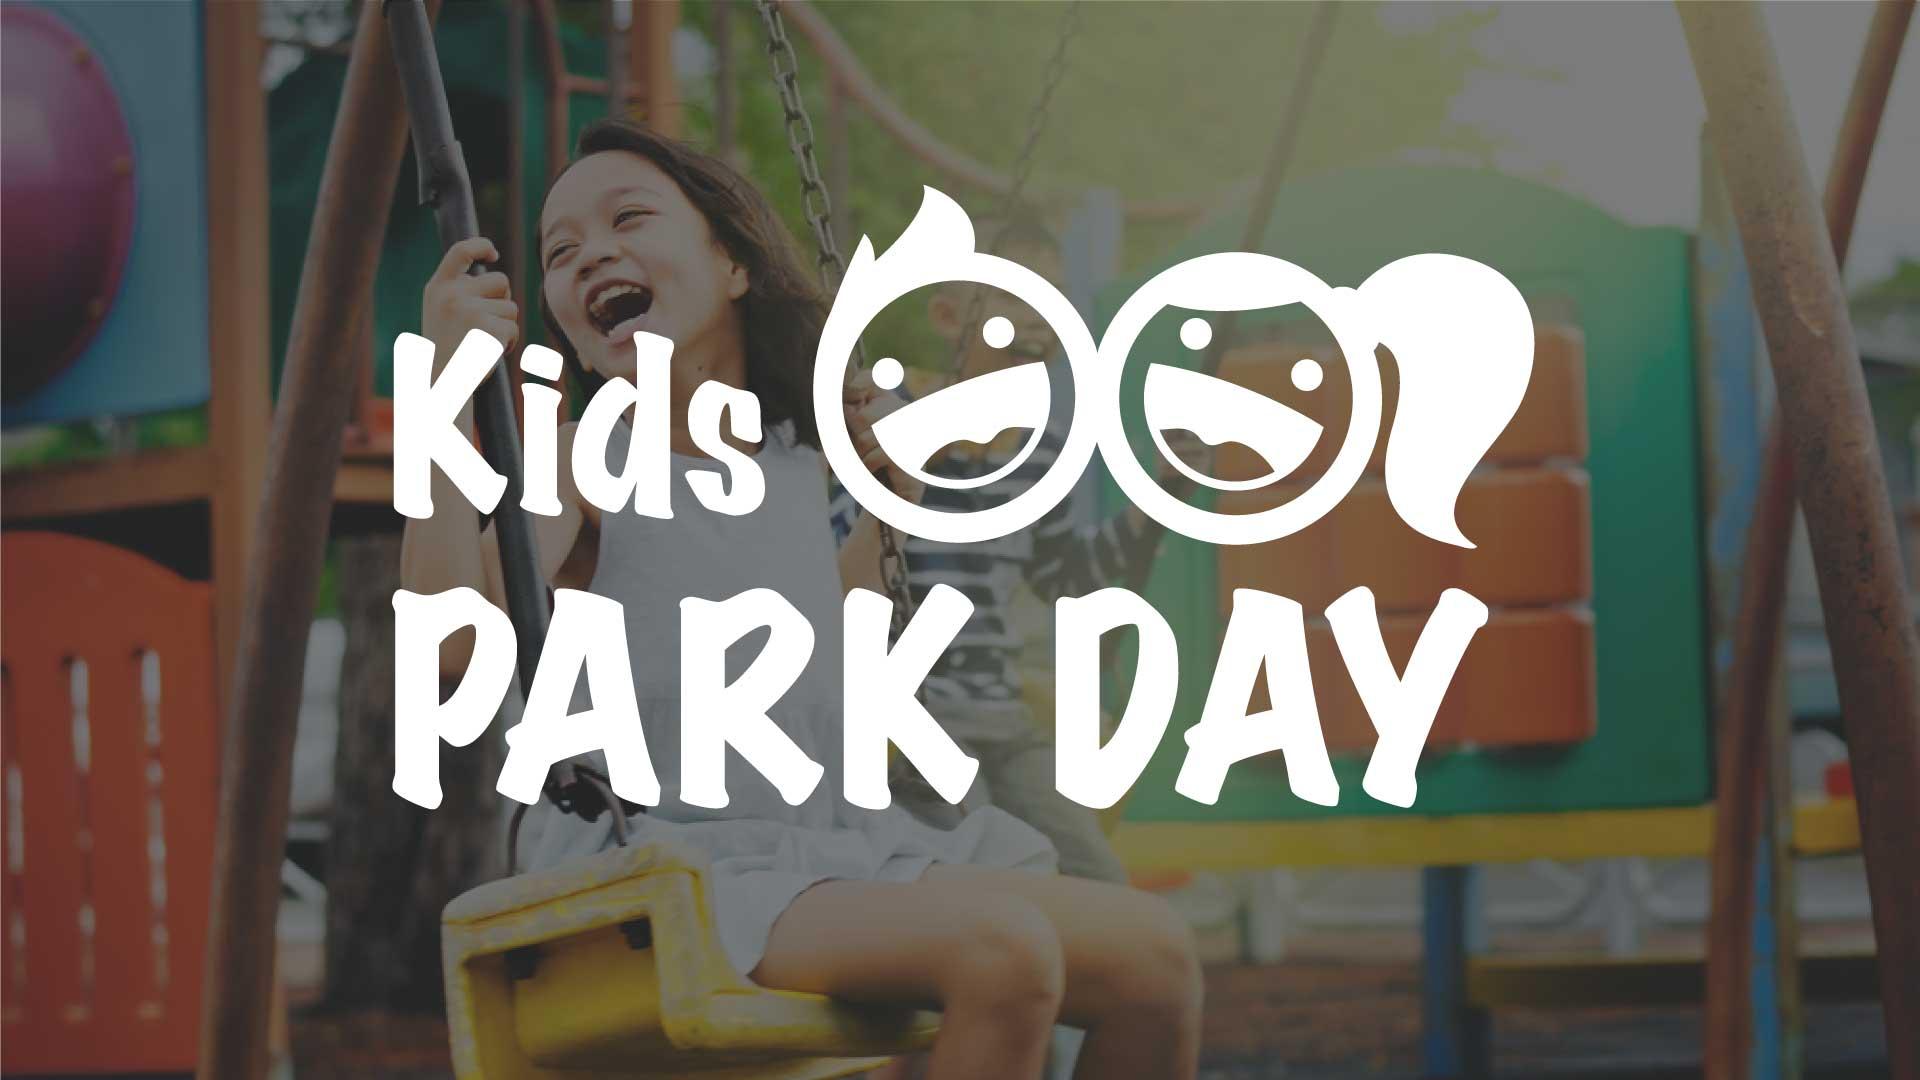 FCC Kids Park Day